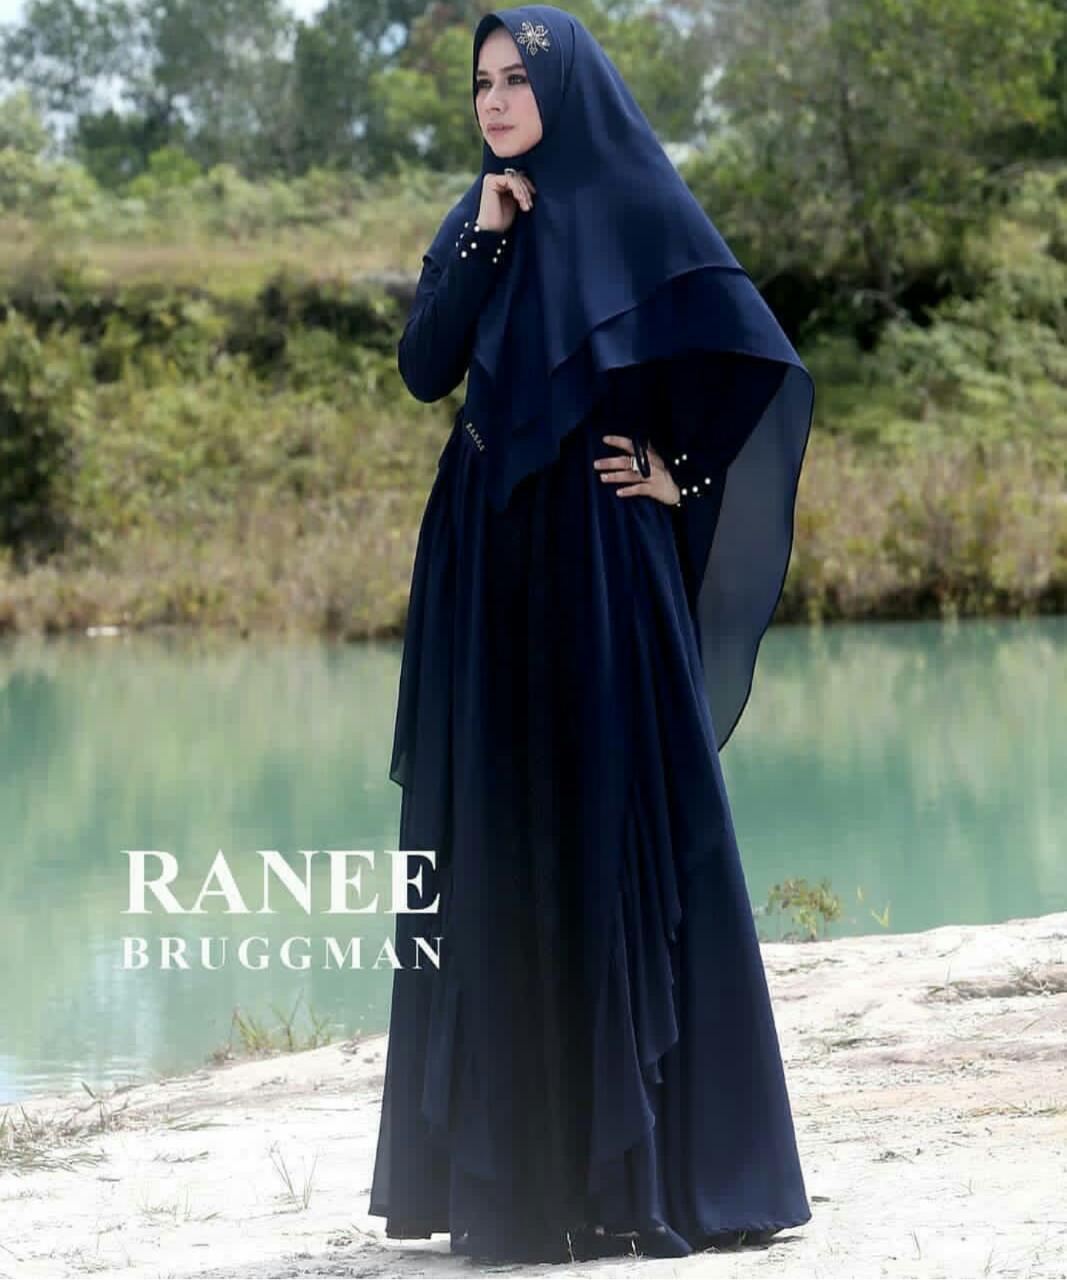 ALIYAH SYARI by RANEE BRUGGMAN Baju Gamis Syari Bahan Ceruty Mix Jersey 1 2 Warna Biru Dongker